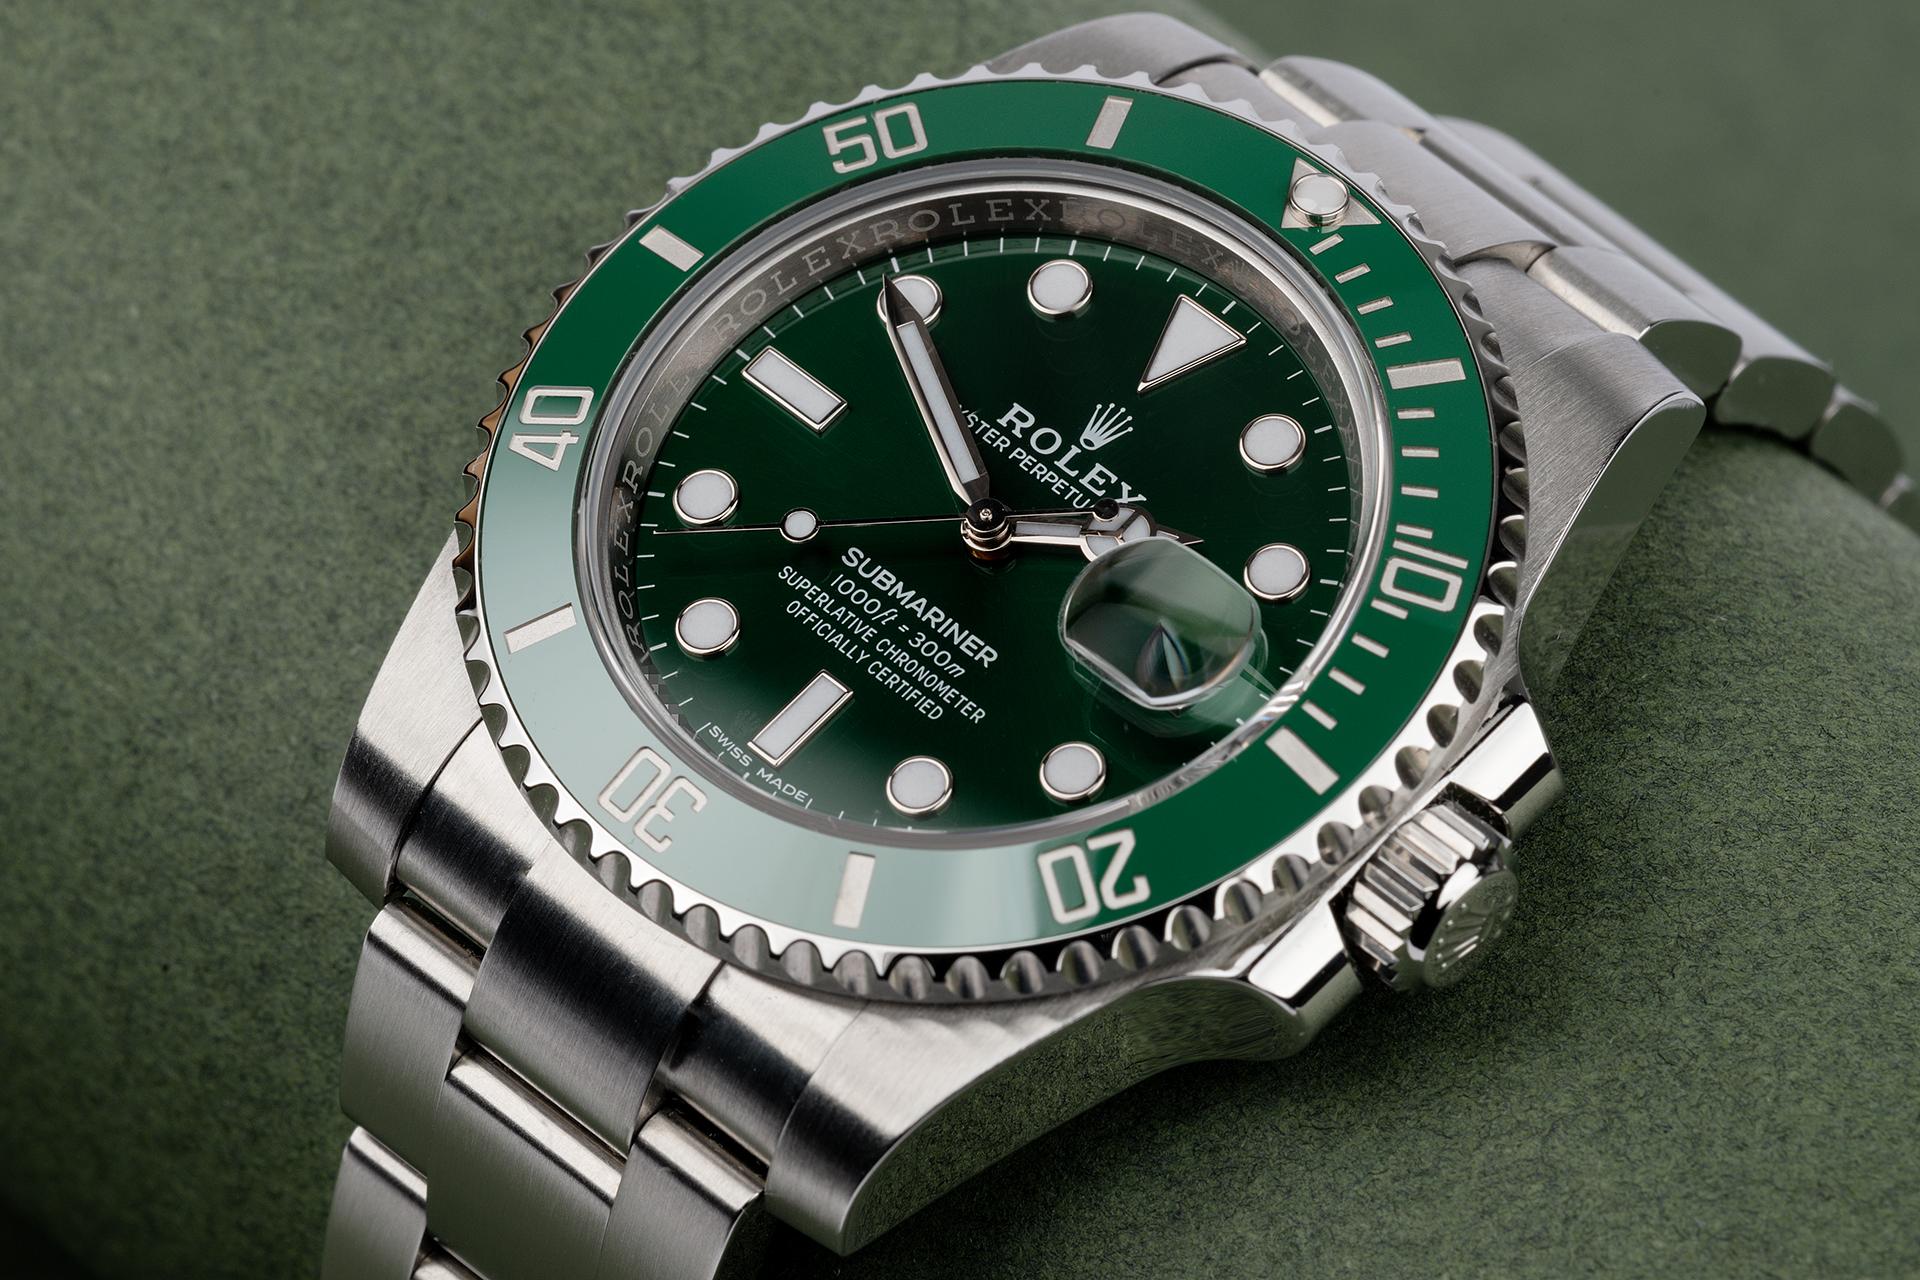 Rolex Submariner Date 116610LV Hulk - 2